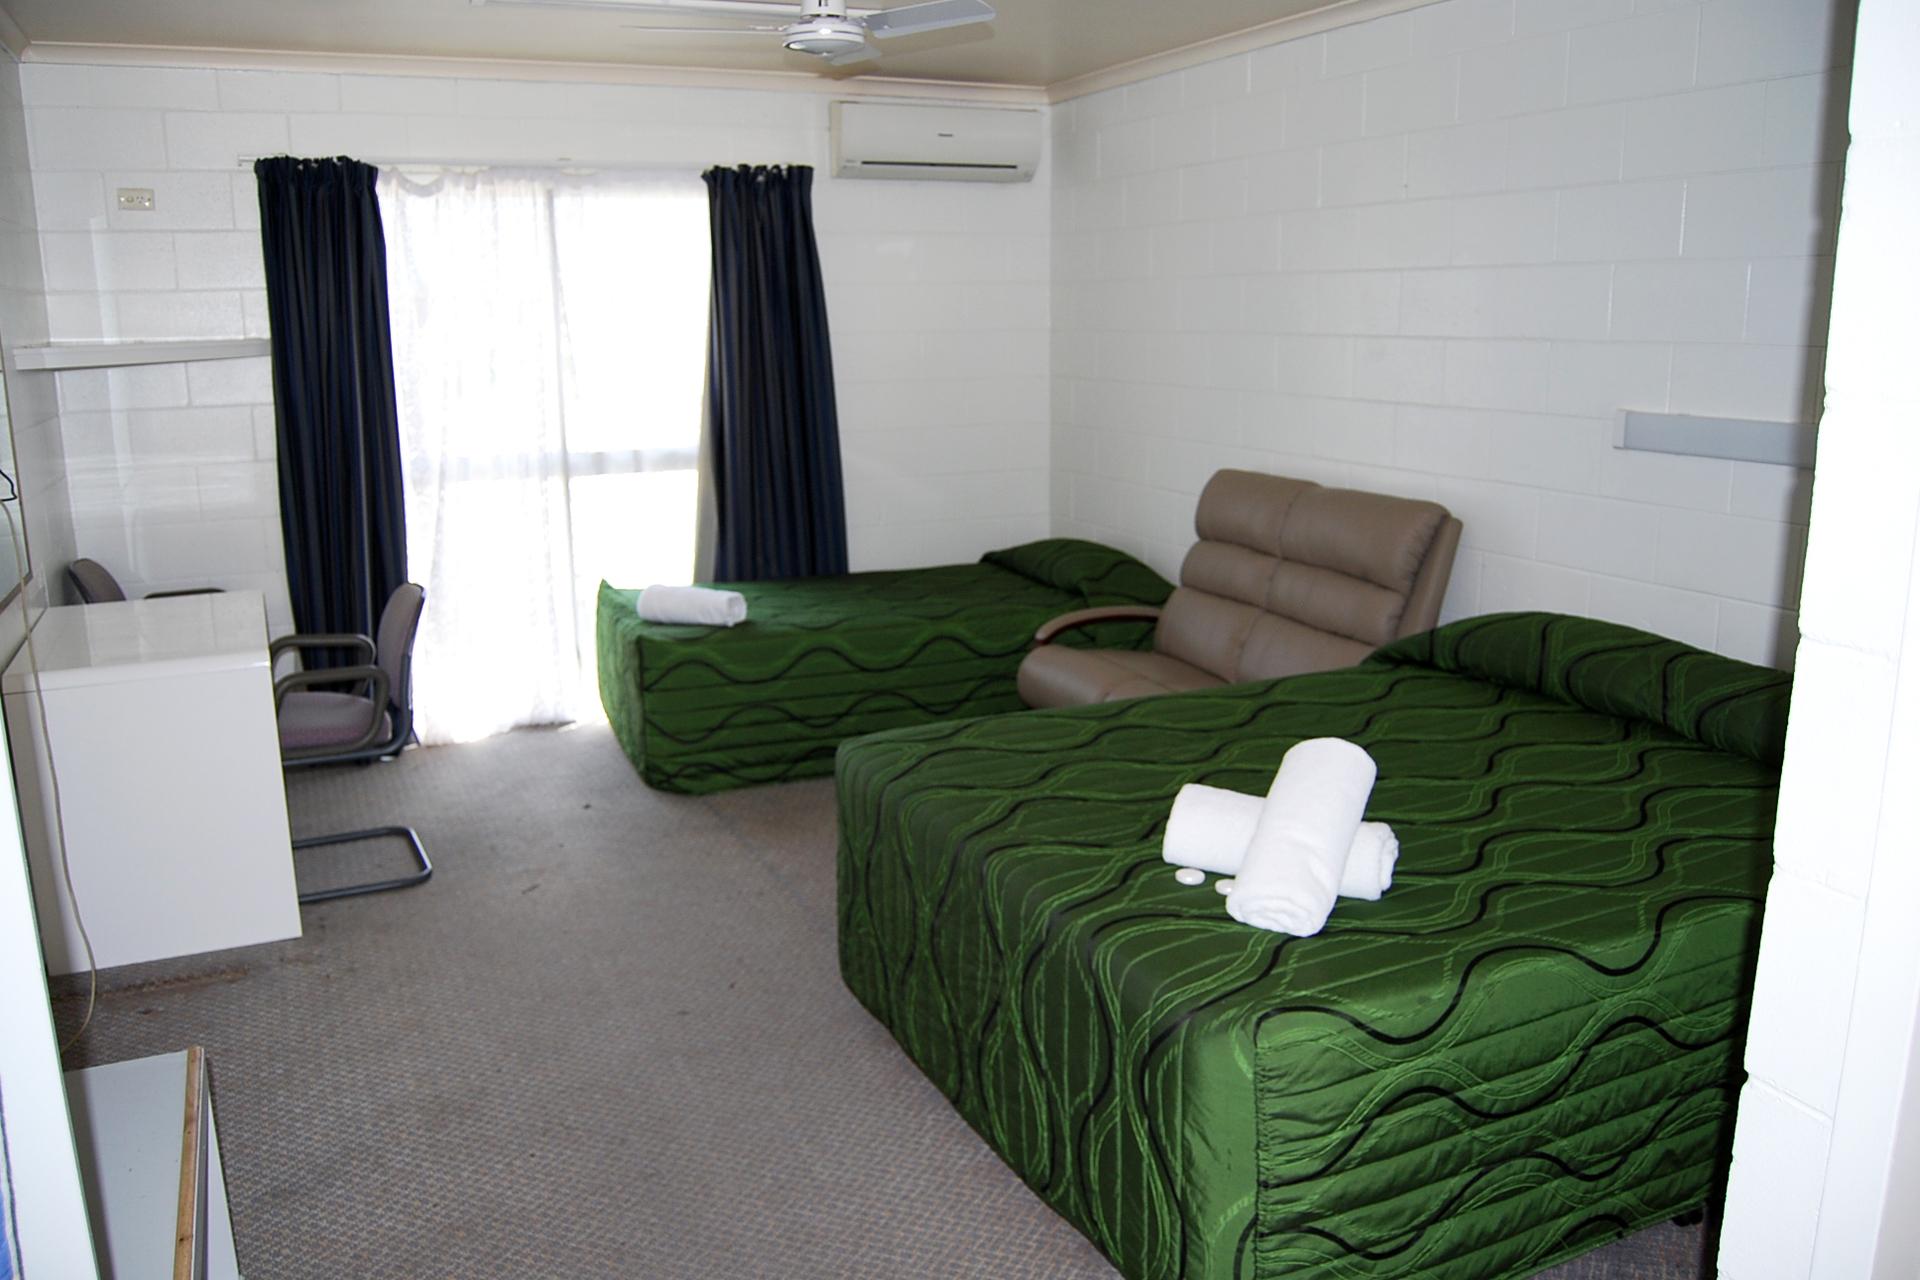 b - Park Hotel Motel